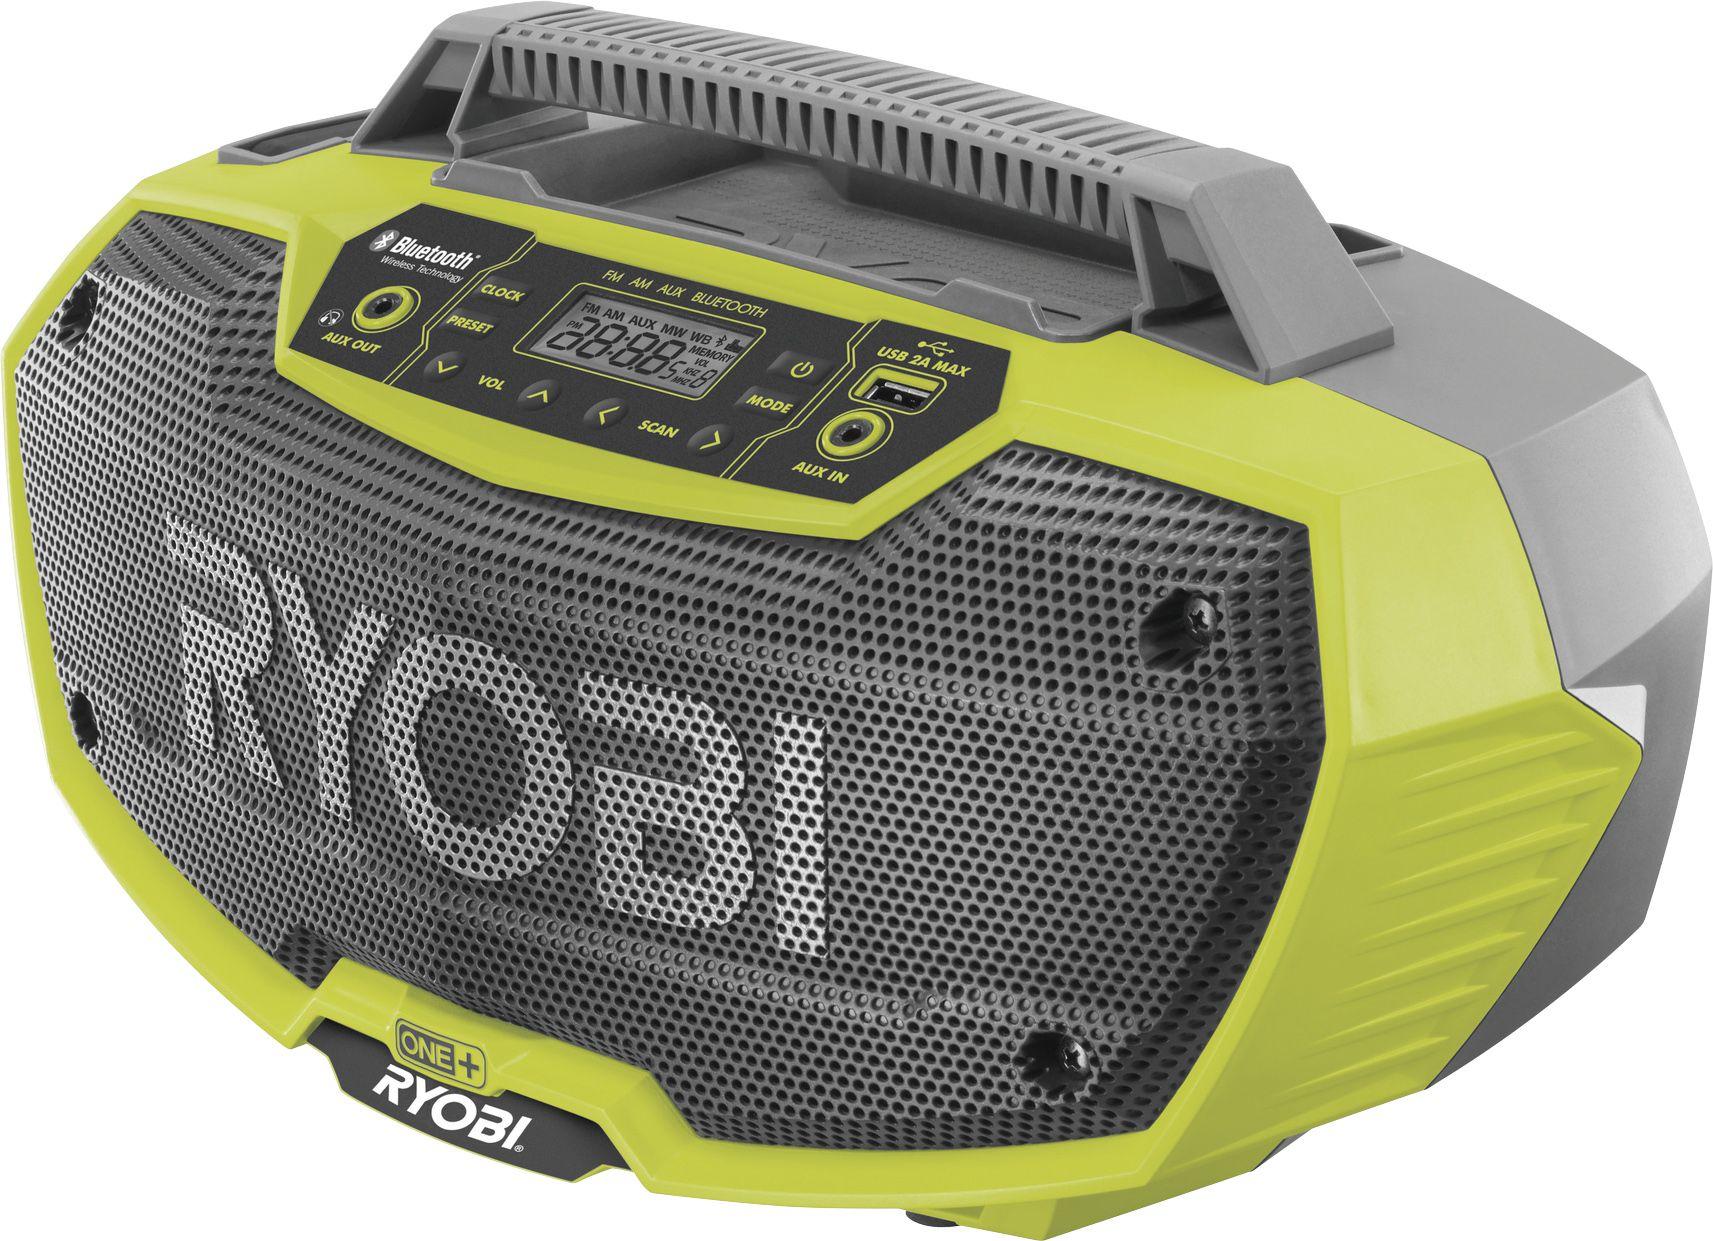 2456317afb8 Raadio Ryobi One+ R18RH-0, 18 V